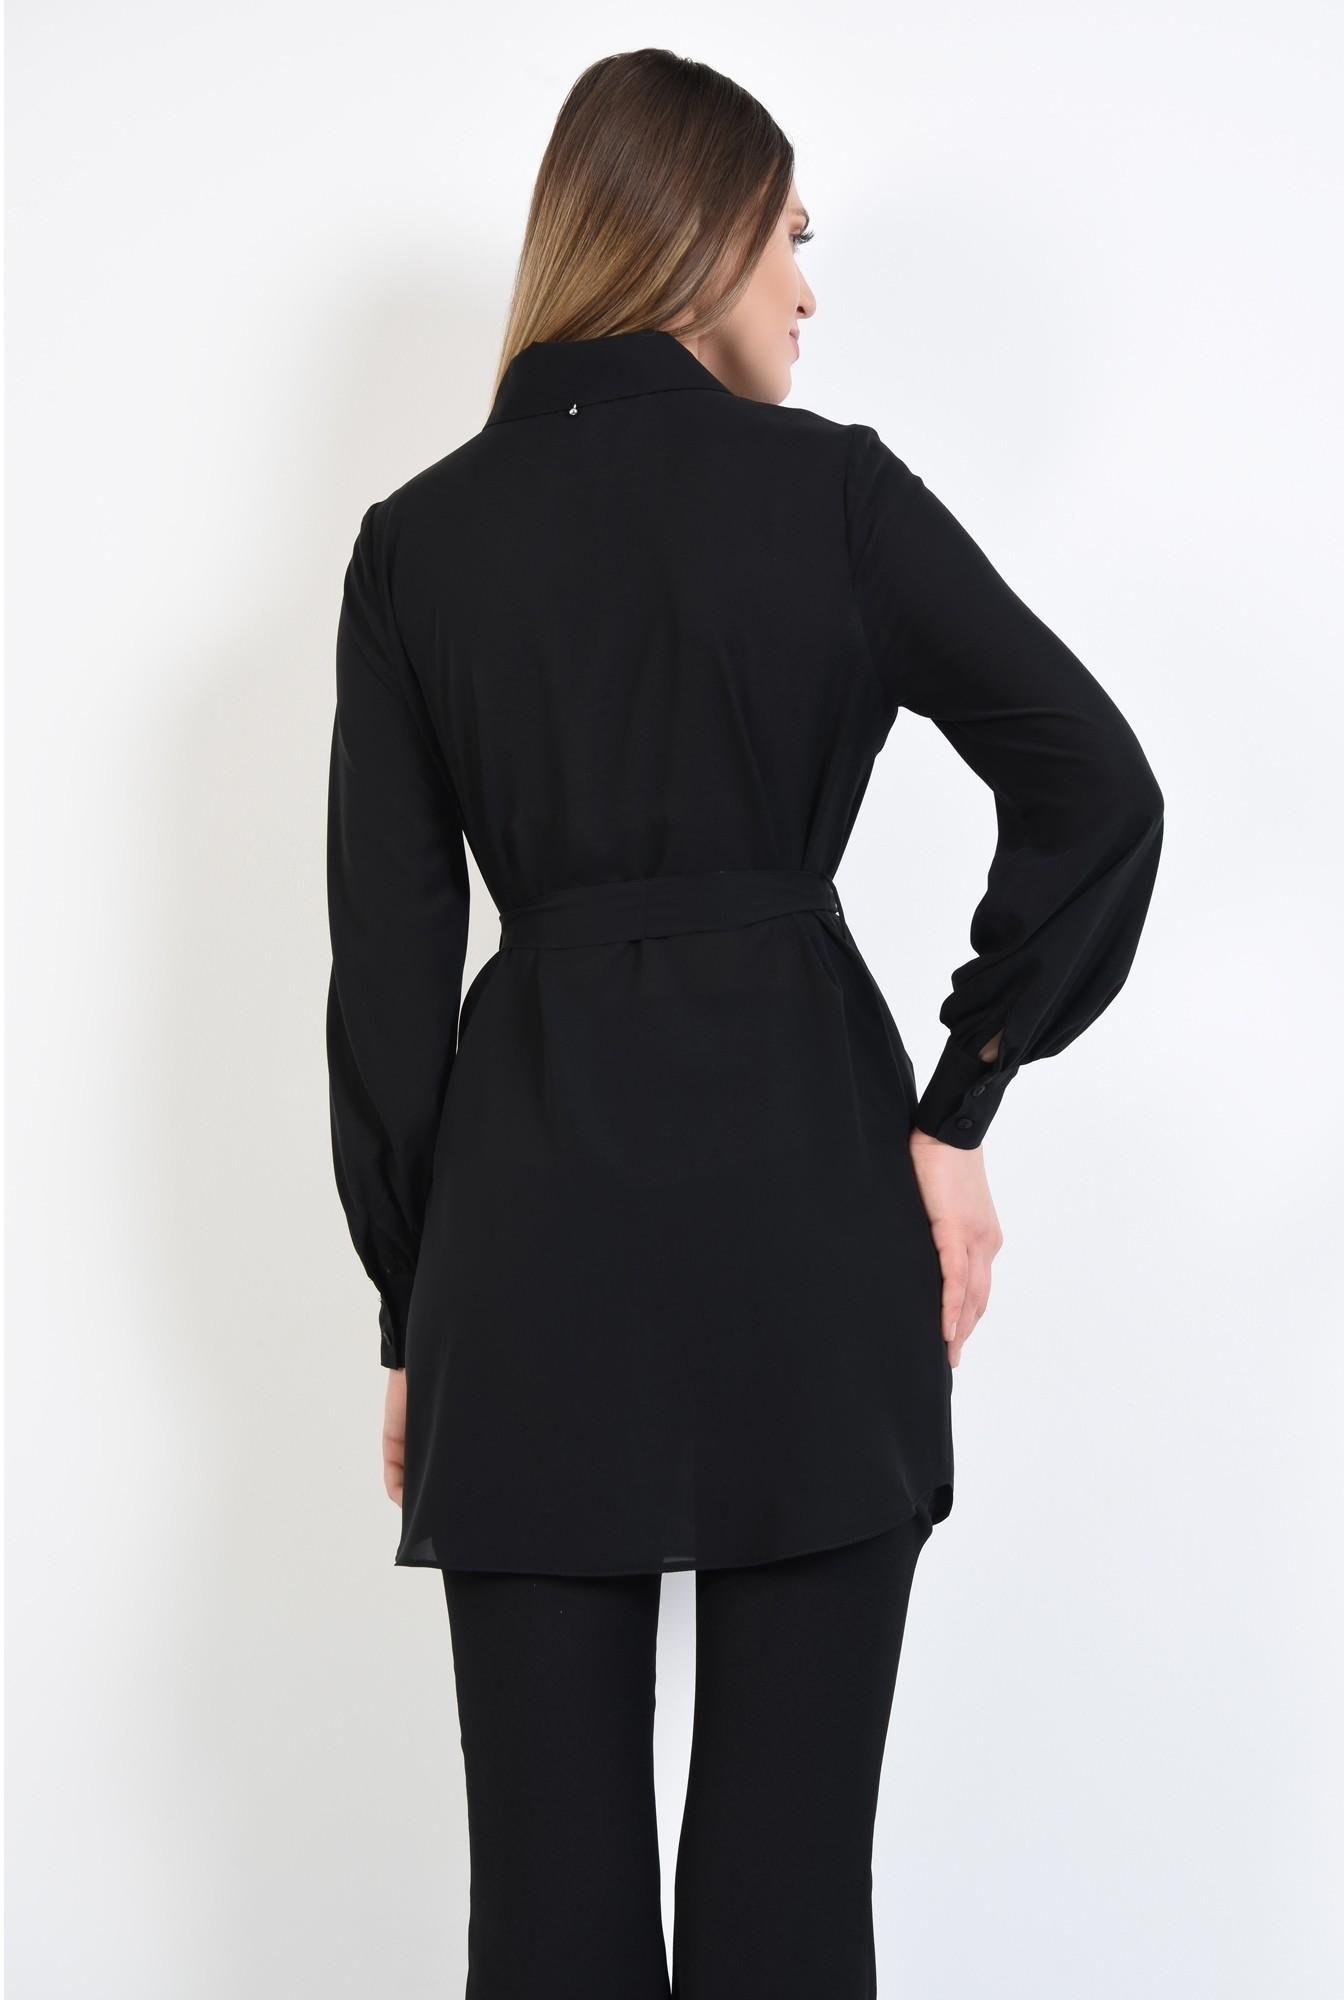 1 - camasa lunga, neagra, cu cordon, funda la talie, tunica